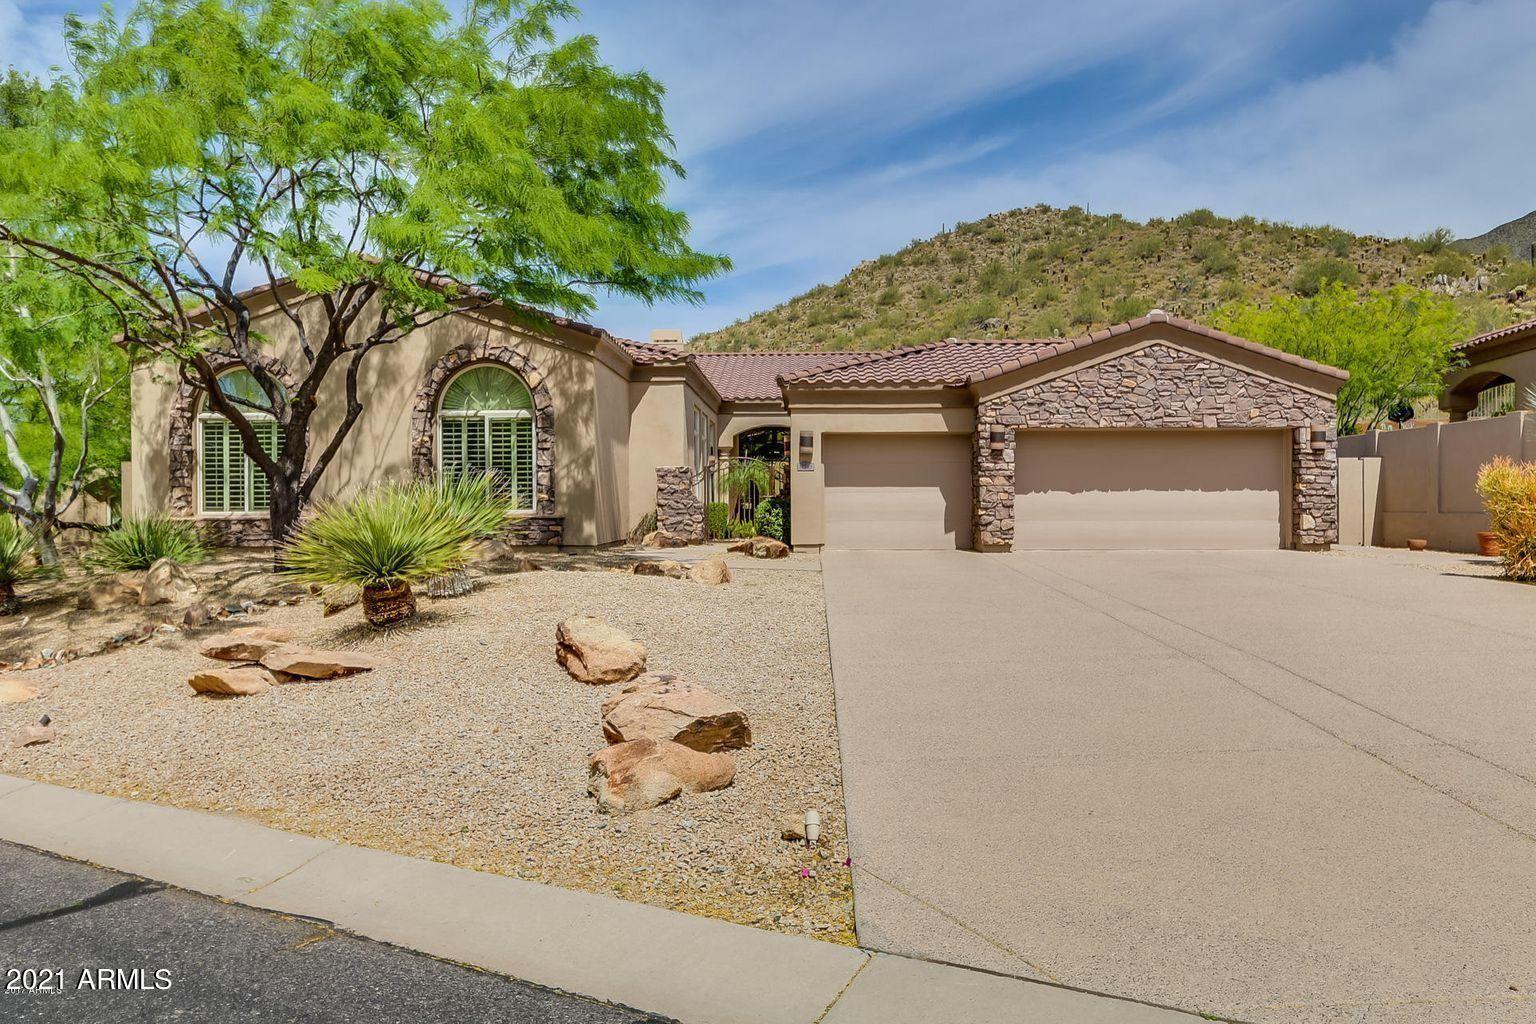 Photo of 11540 E CARIBBEAN Lane, Scottsdale, AZ 85255 (MLS # 6209284)